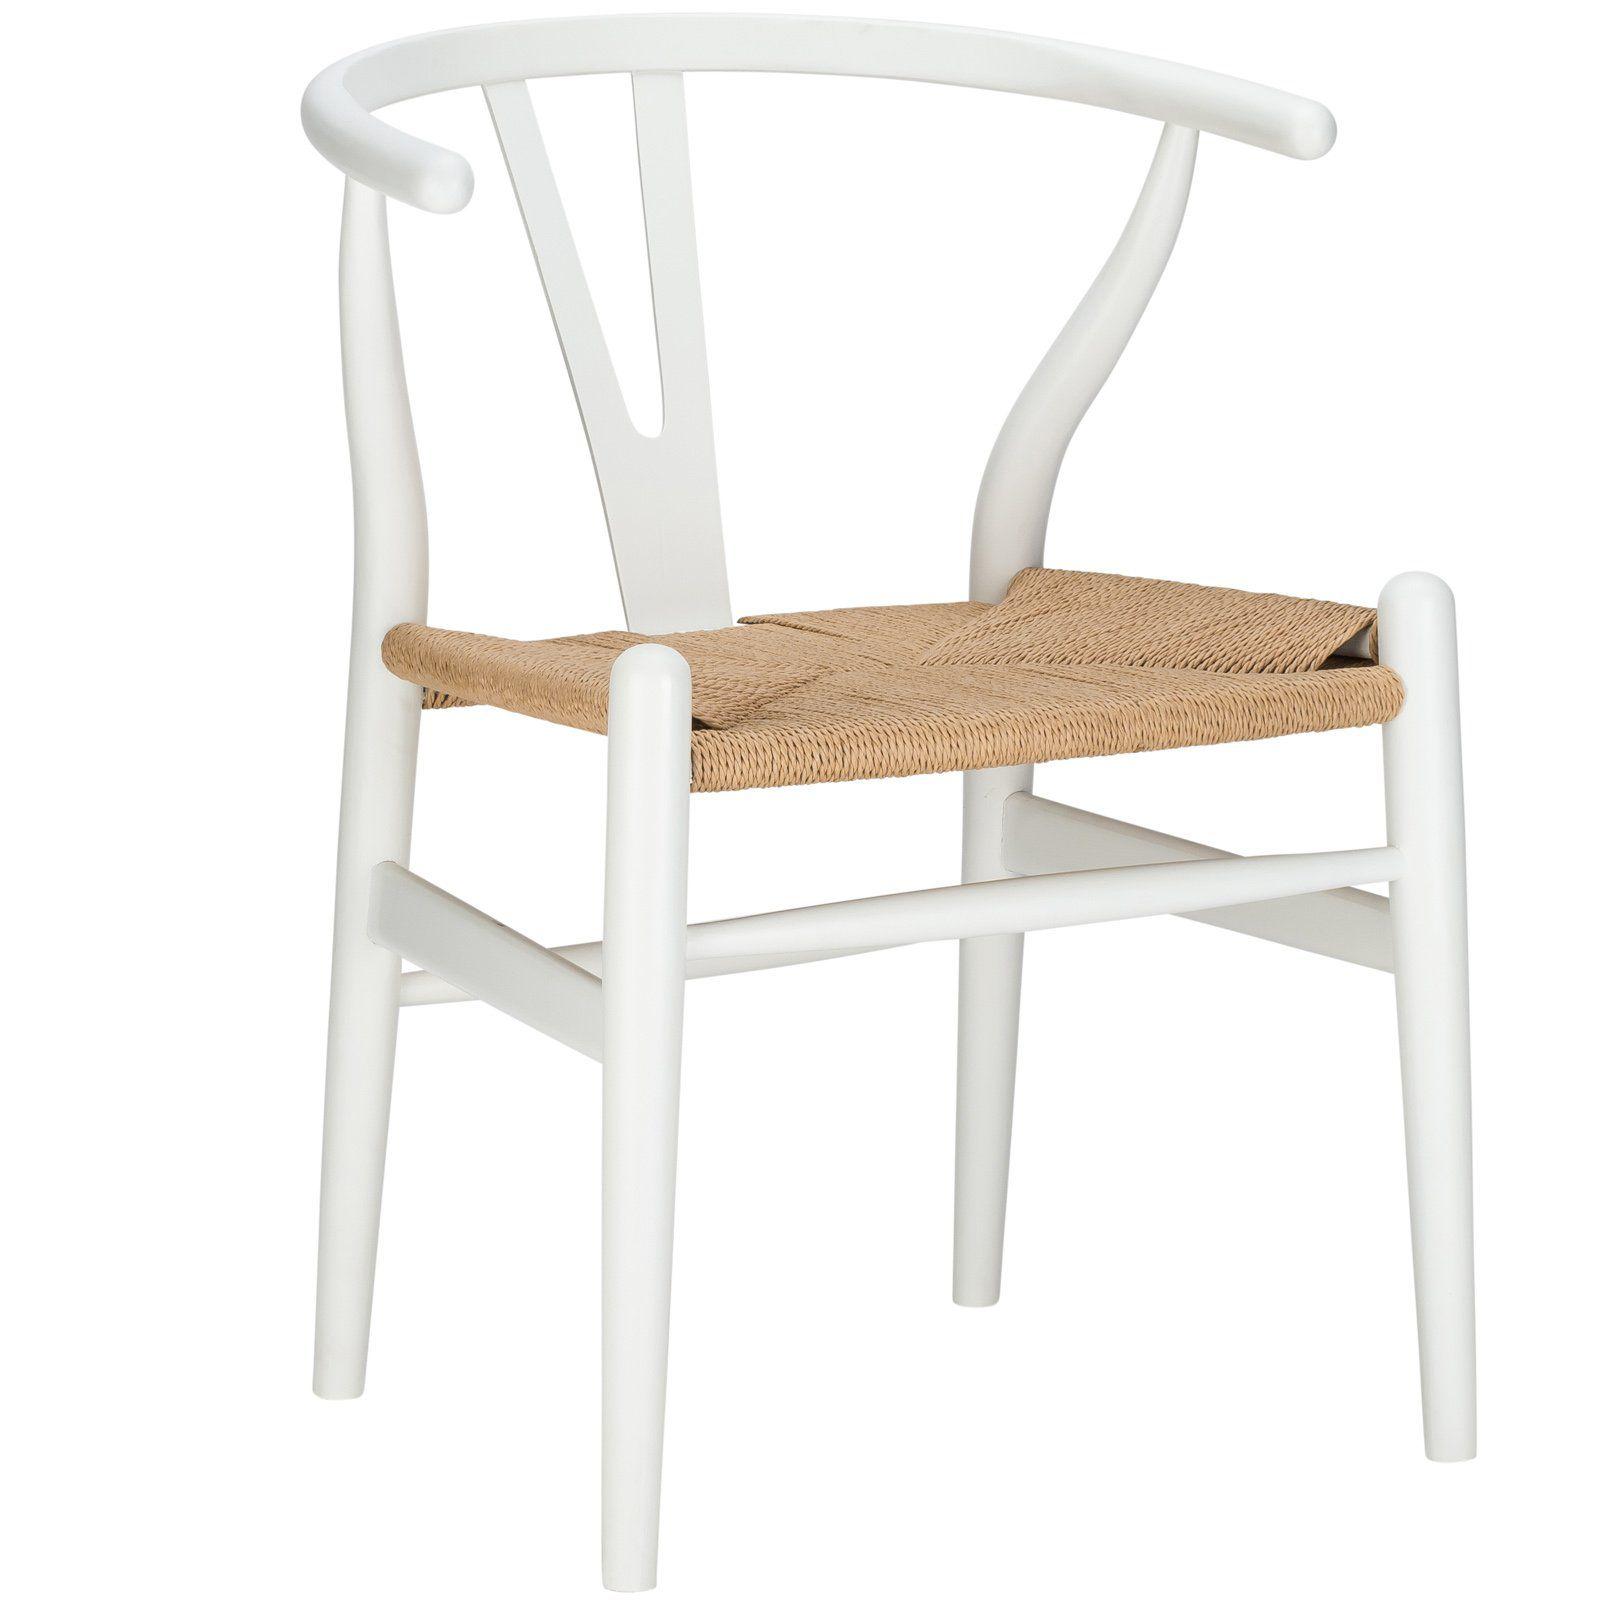 White and woven wishbone chair